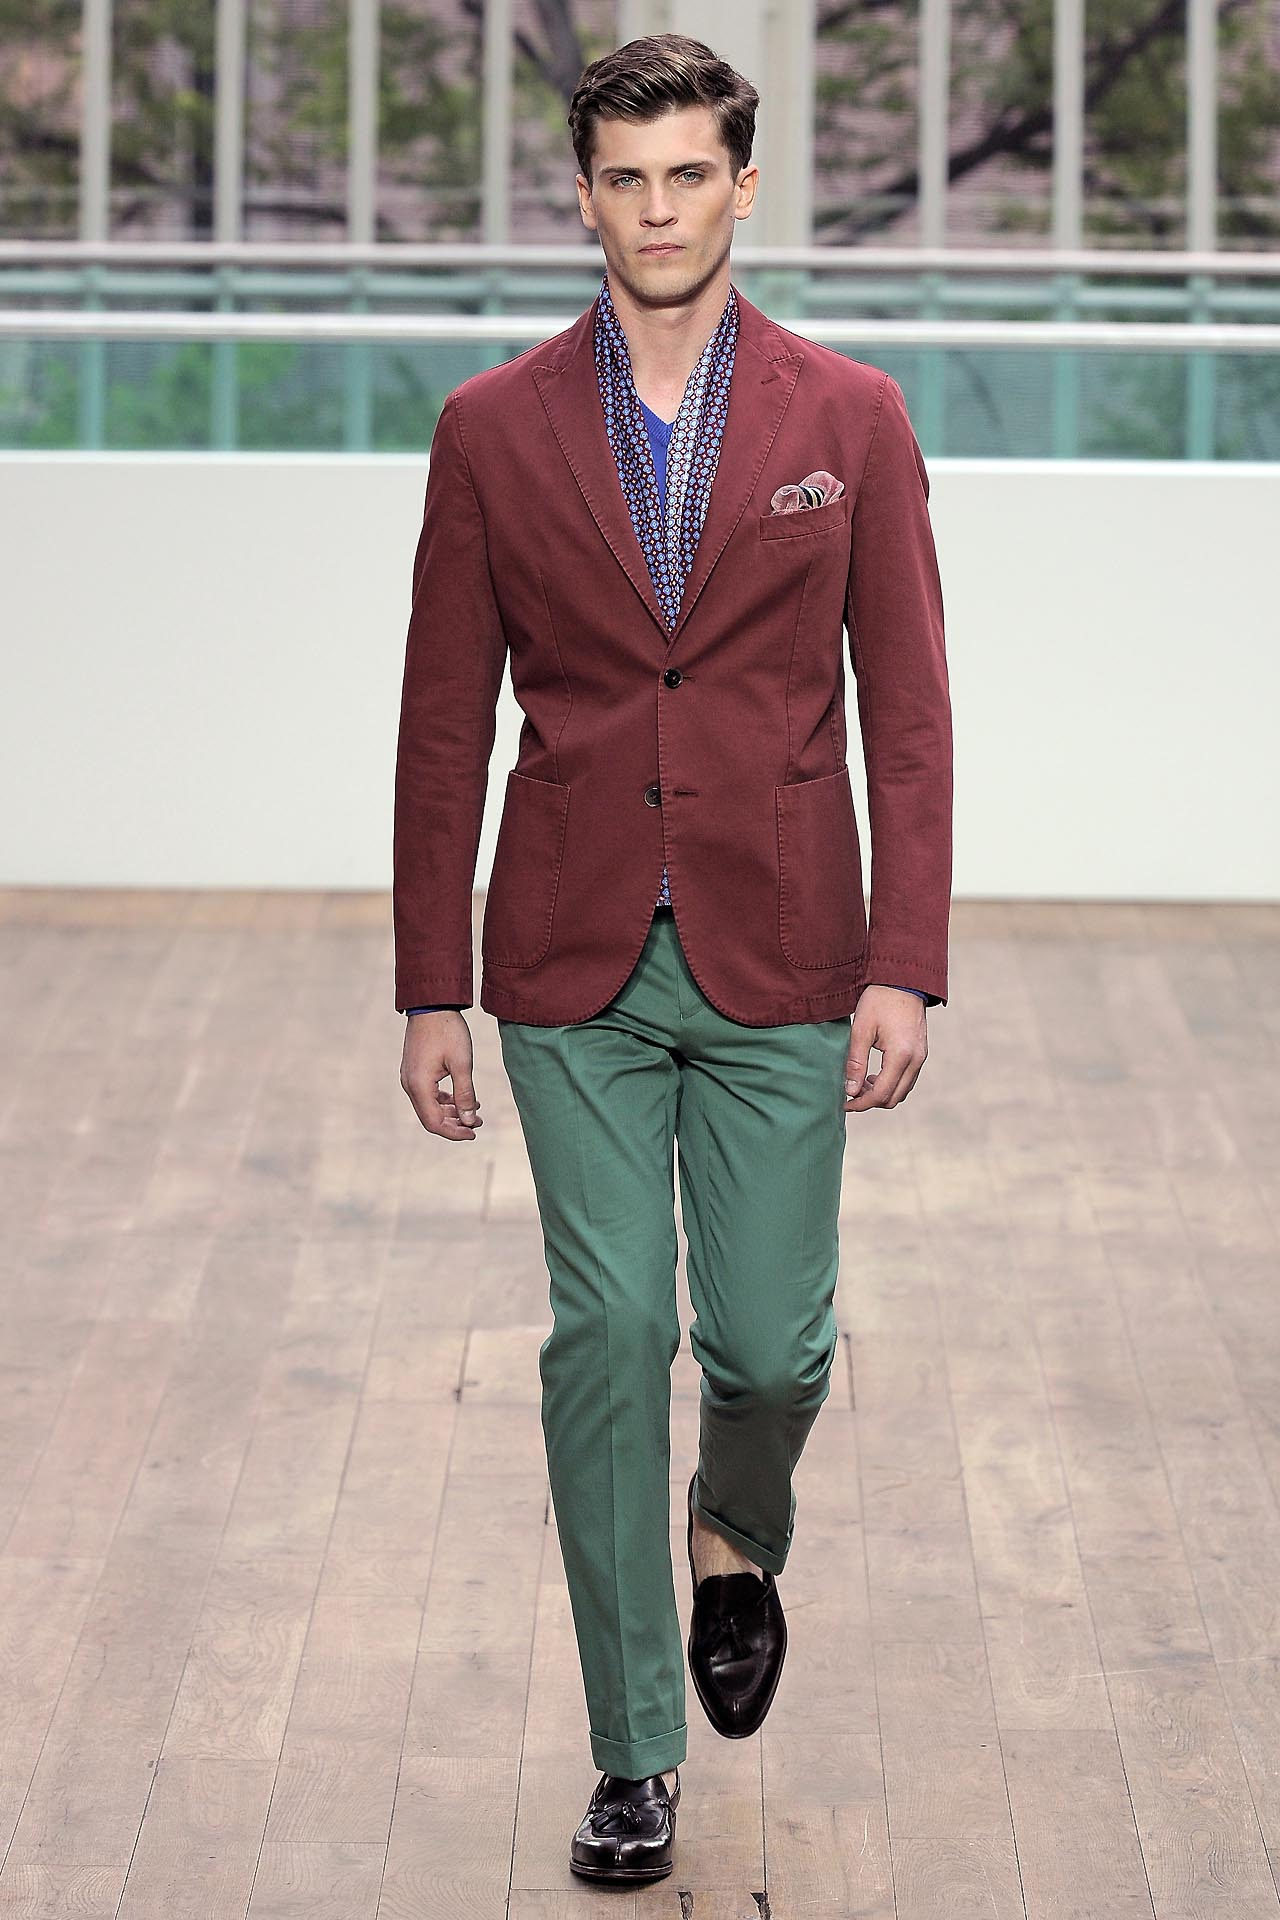 red-jacket-green-pants-hackett-men-style-british-menswear-blog